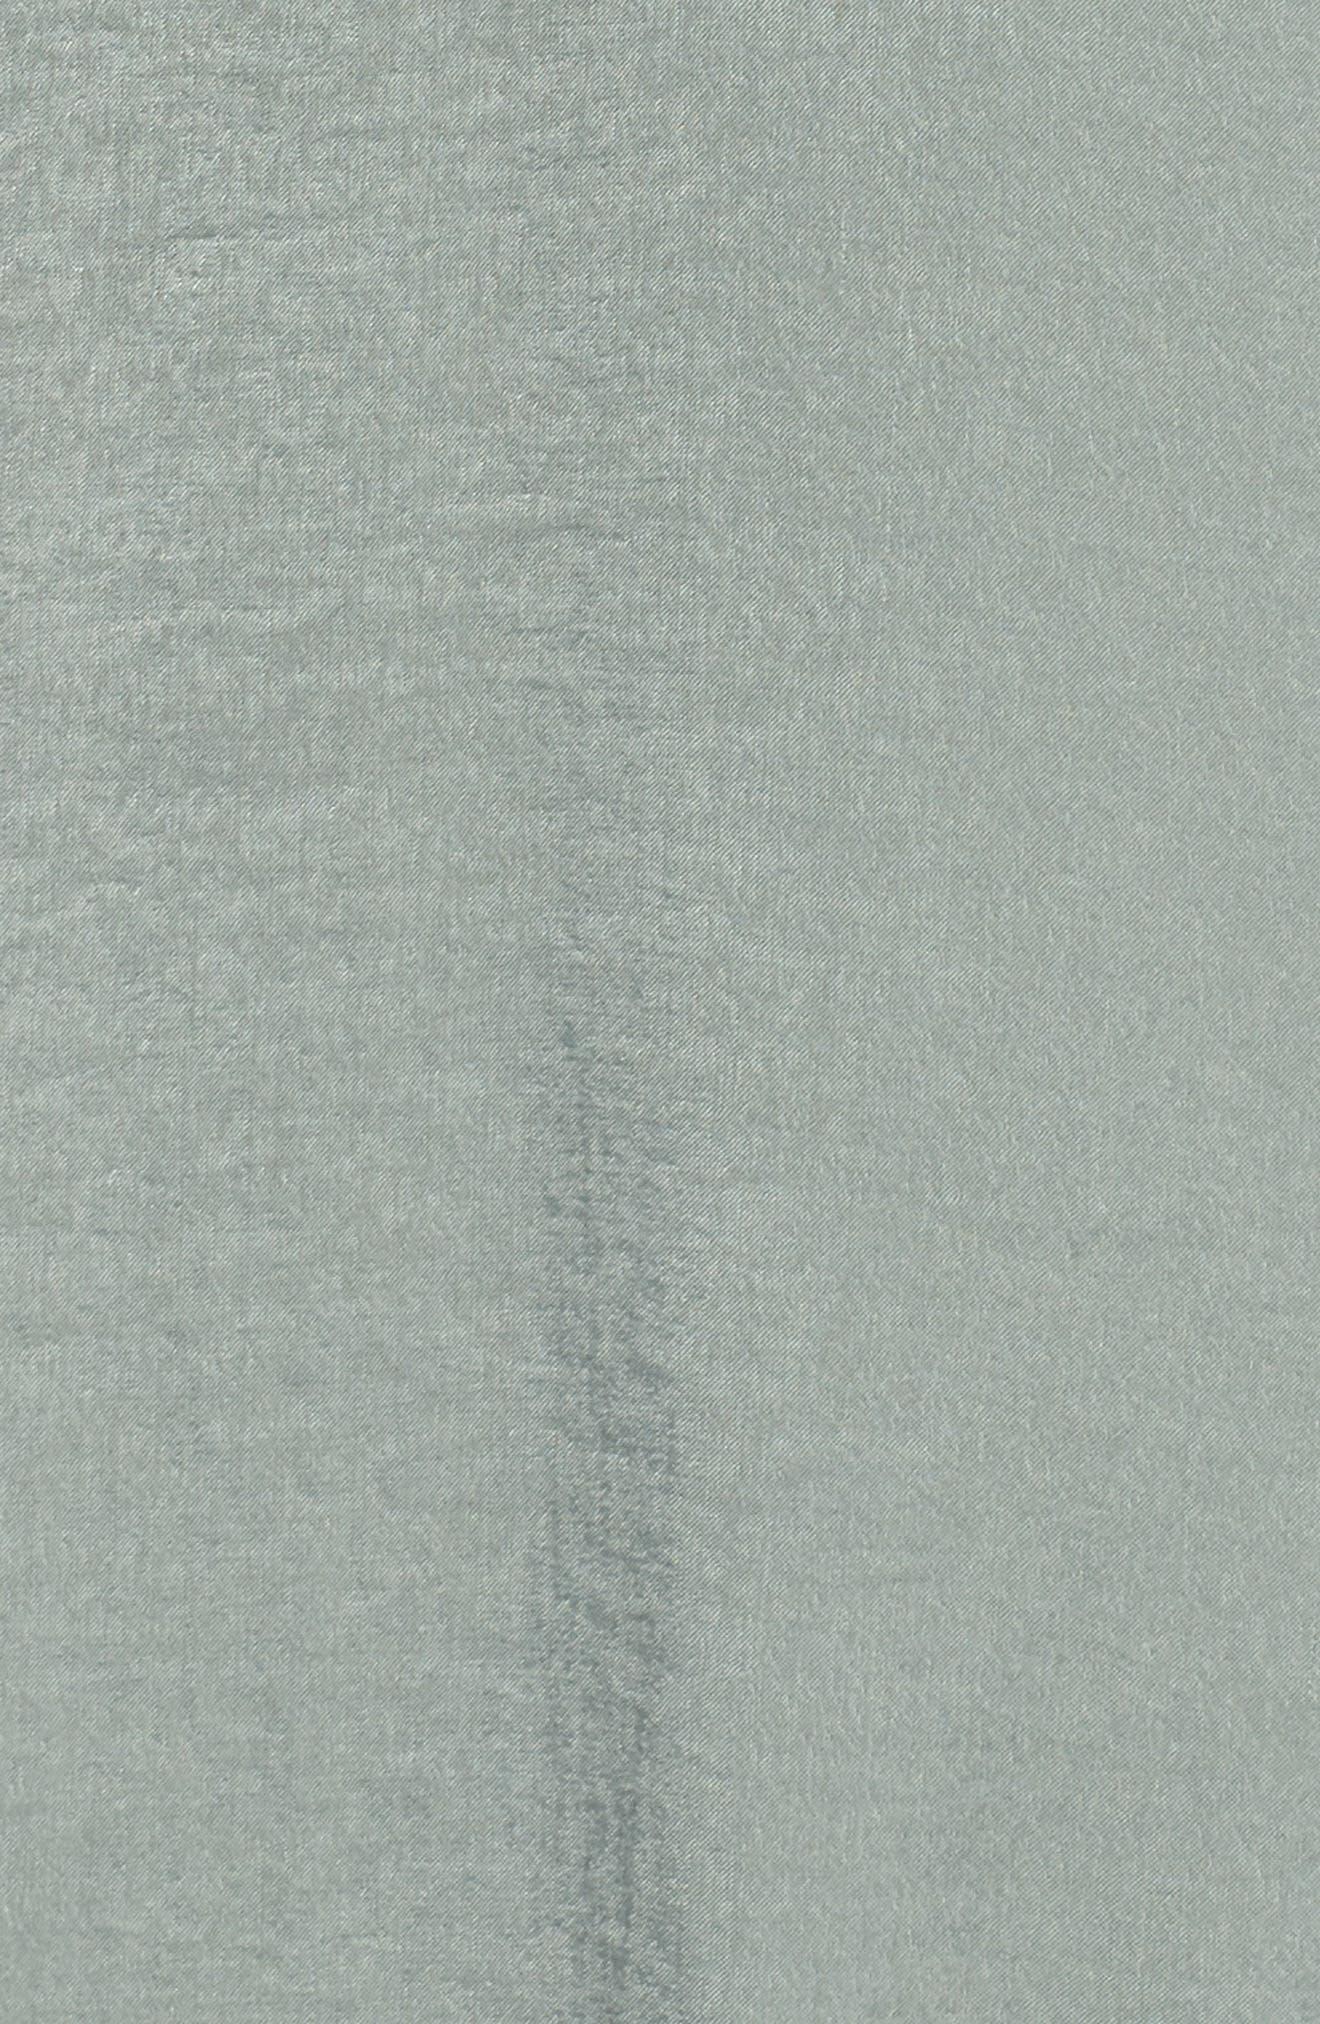 Jennifer Shimmer Satin Wrap Dress,                             Alternate thumbnail 6, color,                             321